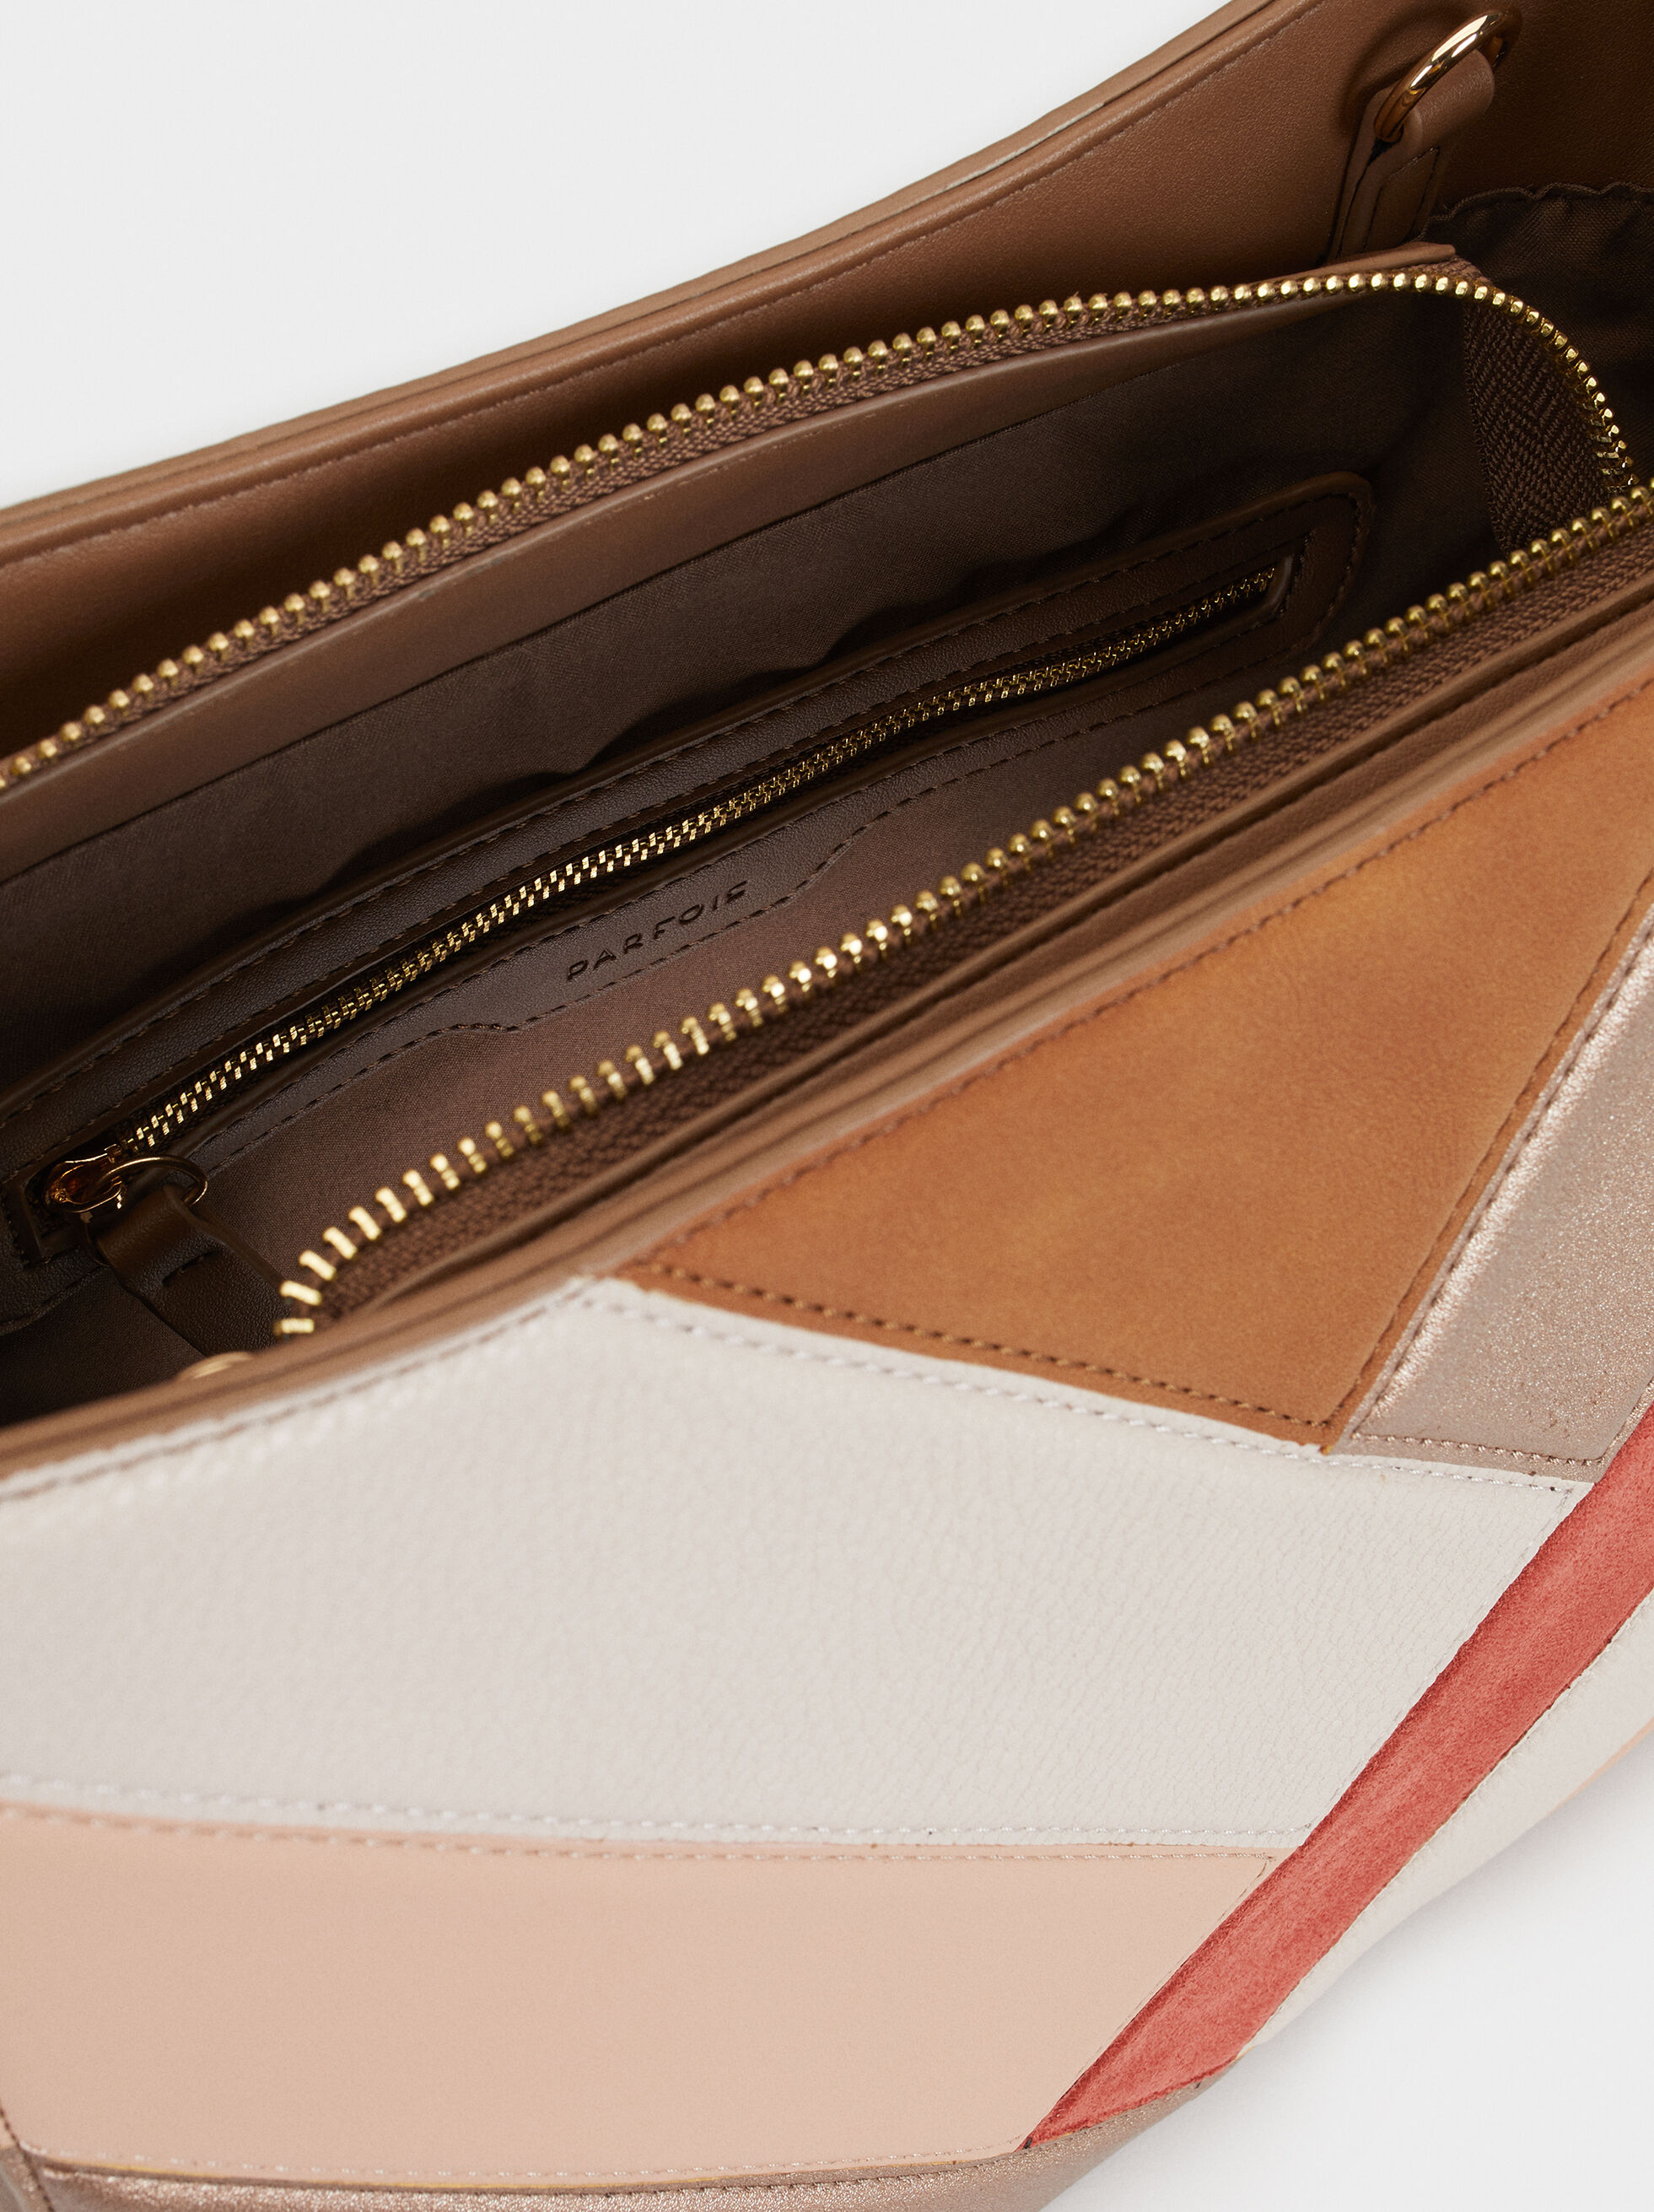 Patchwork Handbag, Pink, hi-res